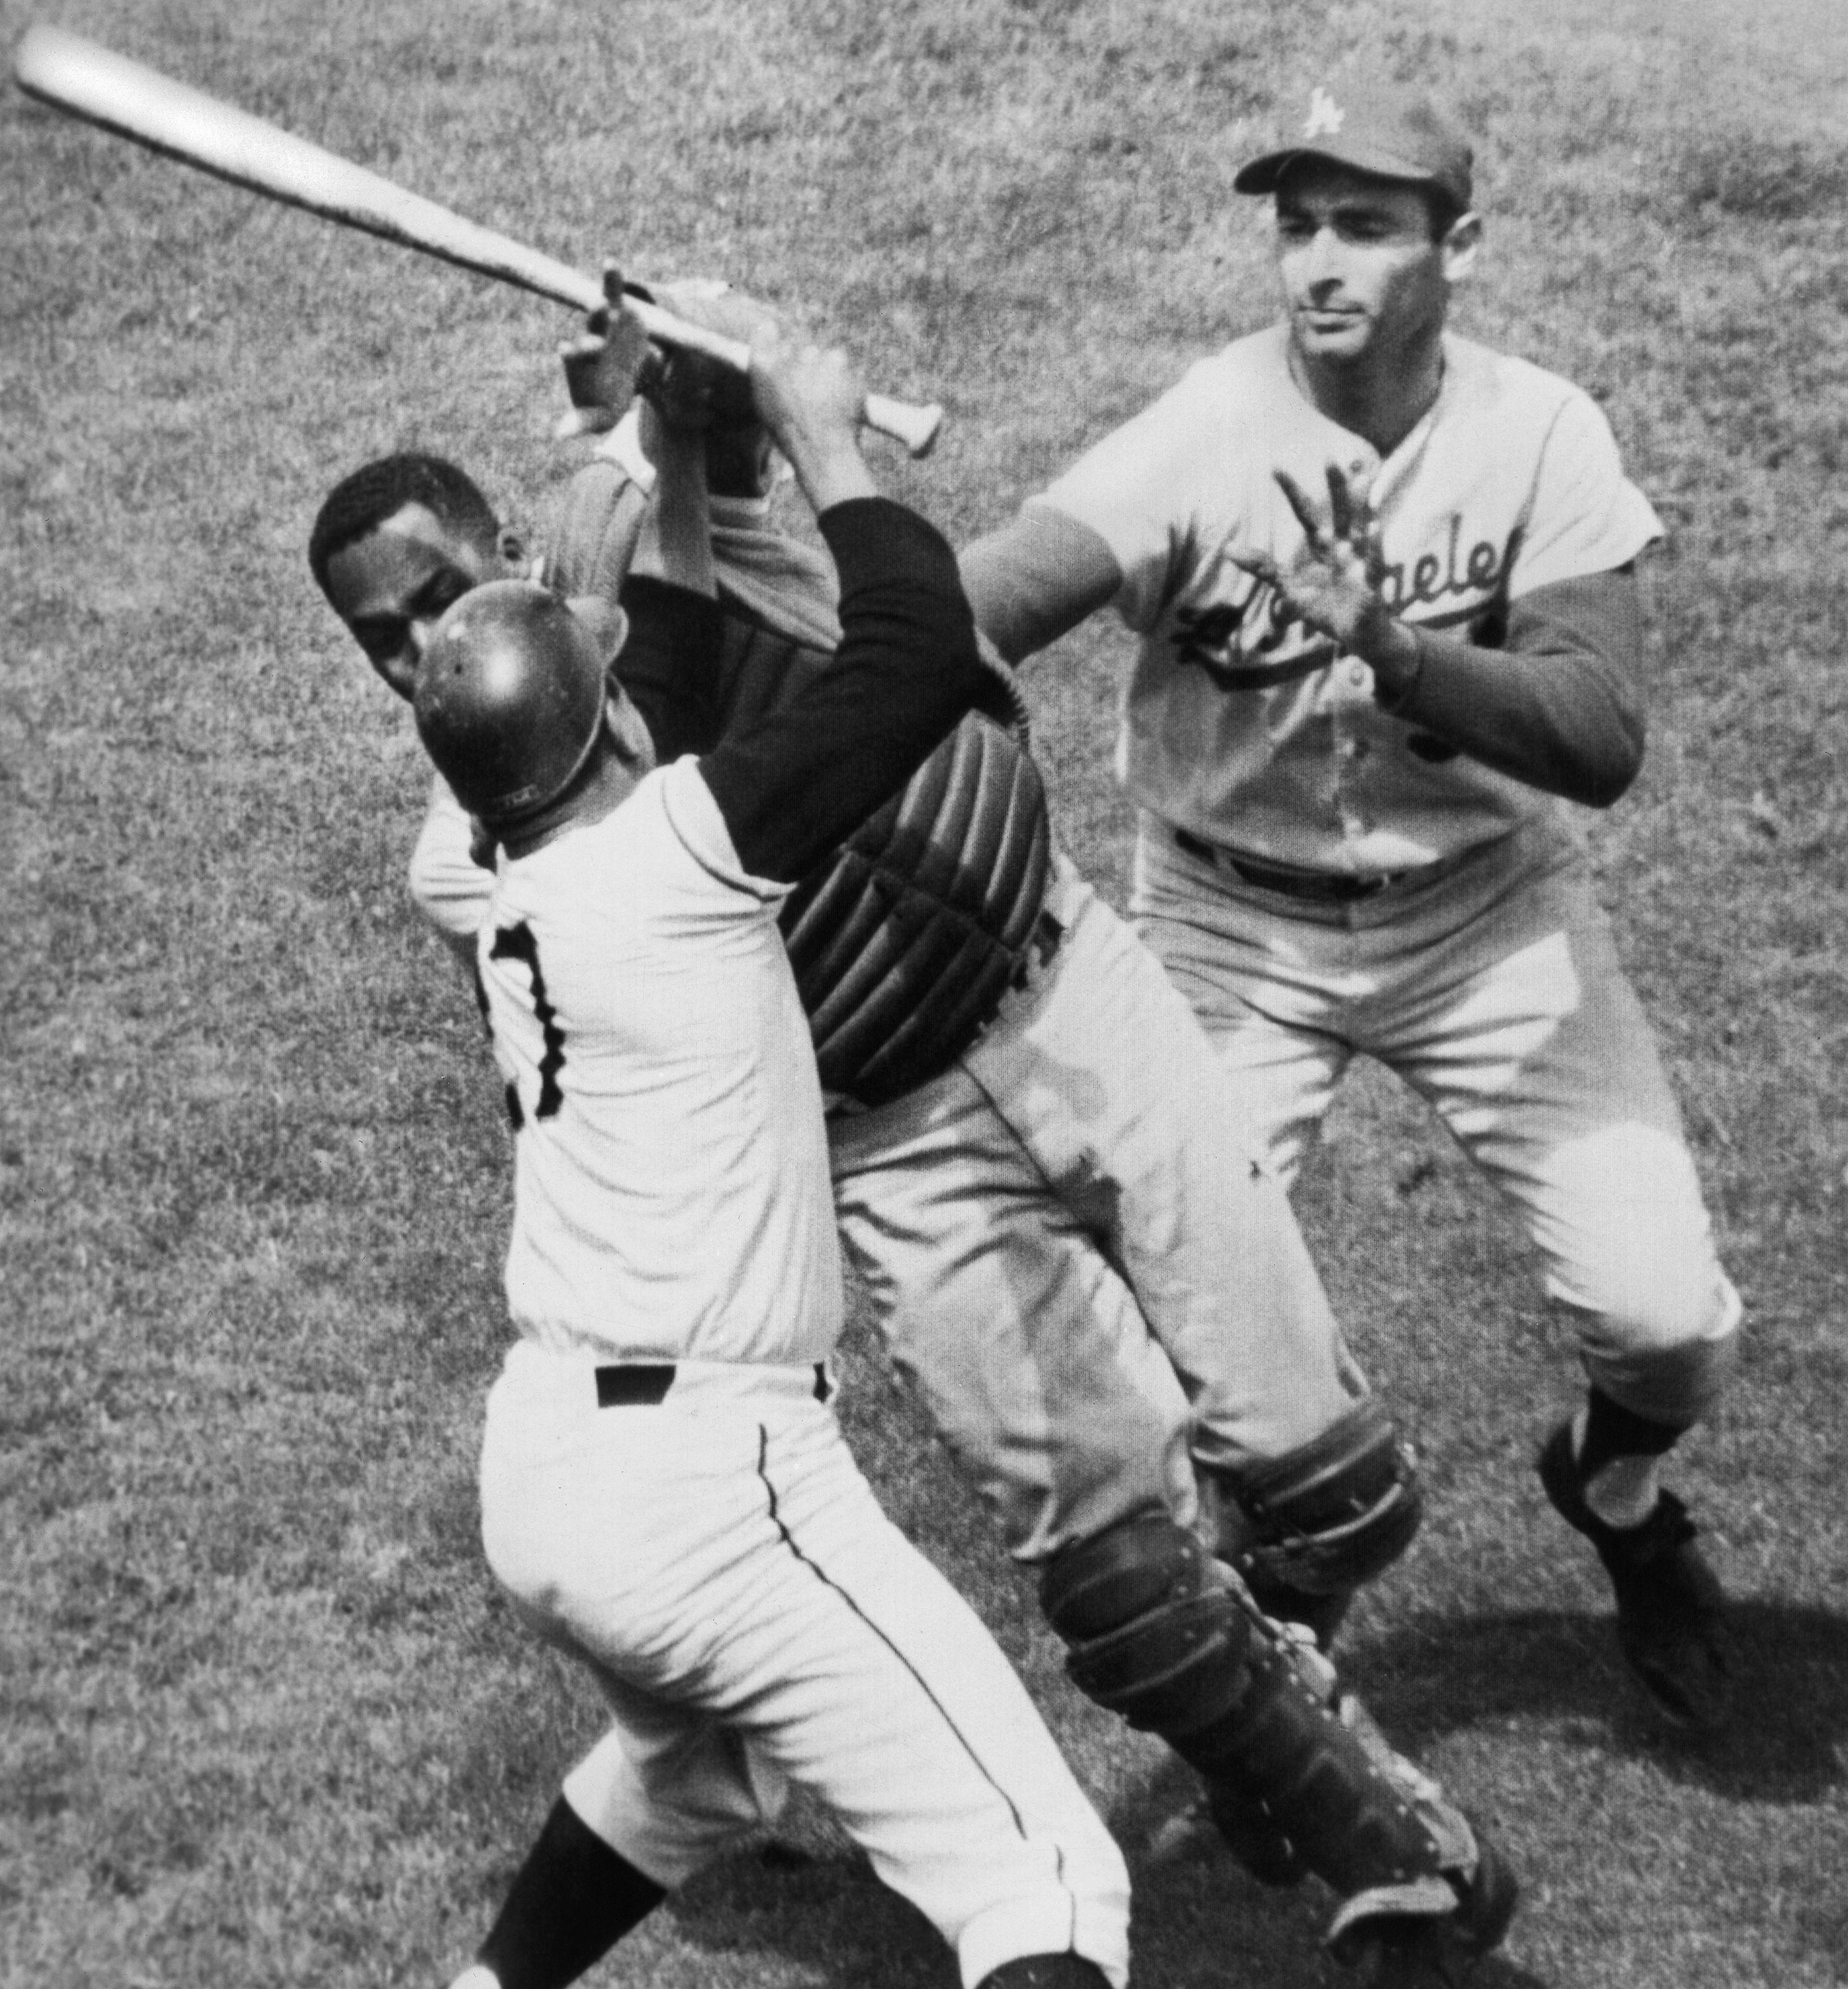 5e9adcca9 Juan Marichal hit John Roseboro with bat in ugly baseball brawl 50 years ago